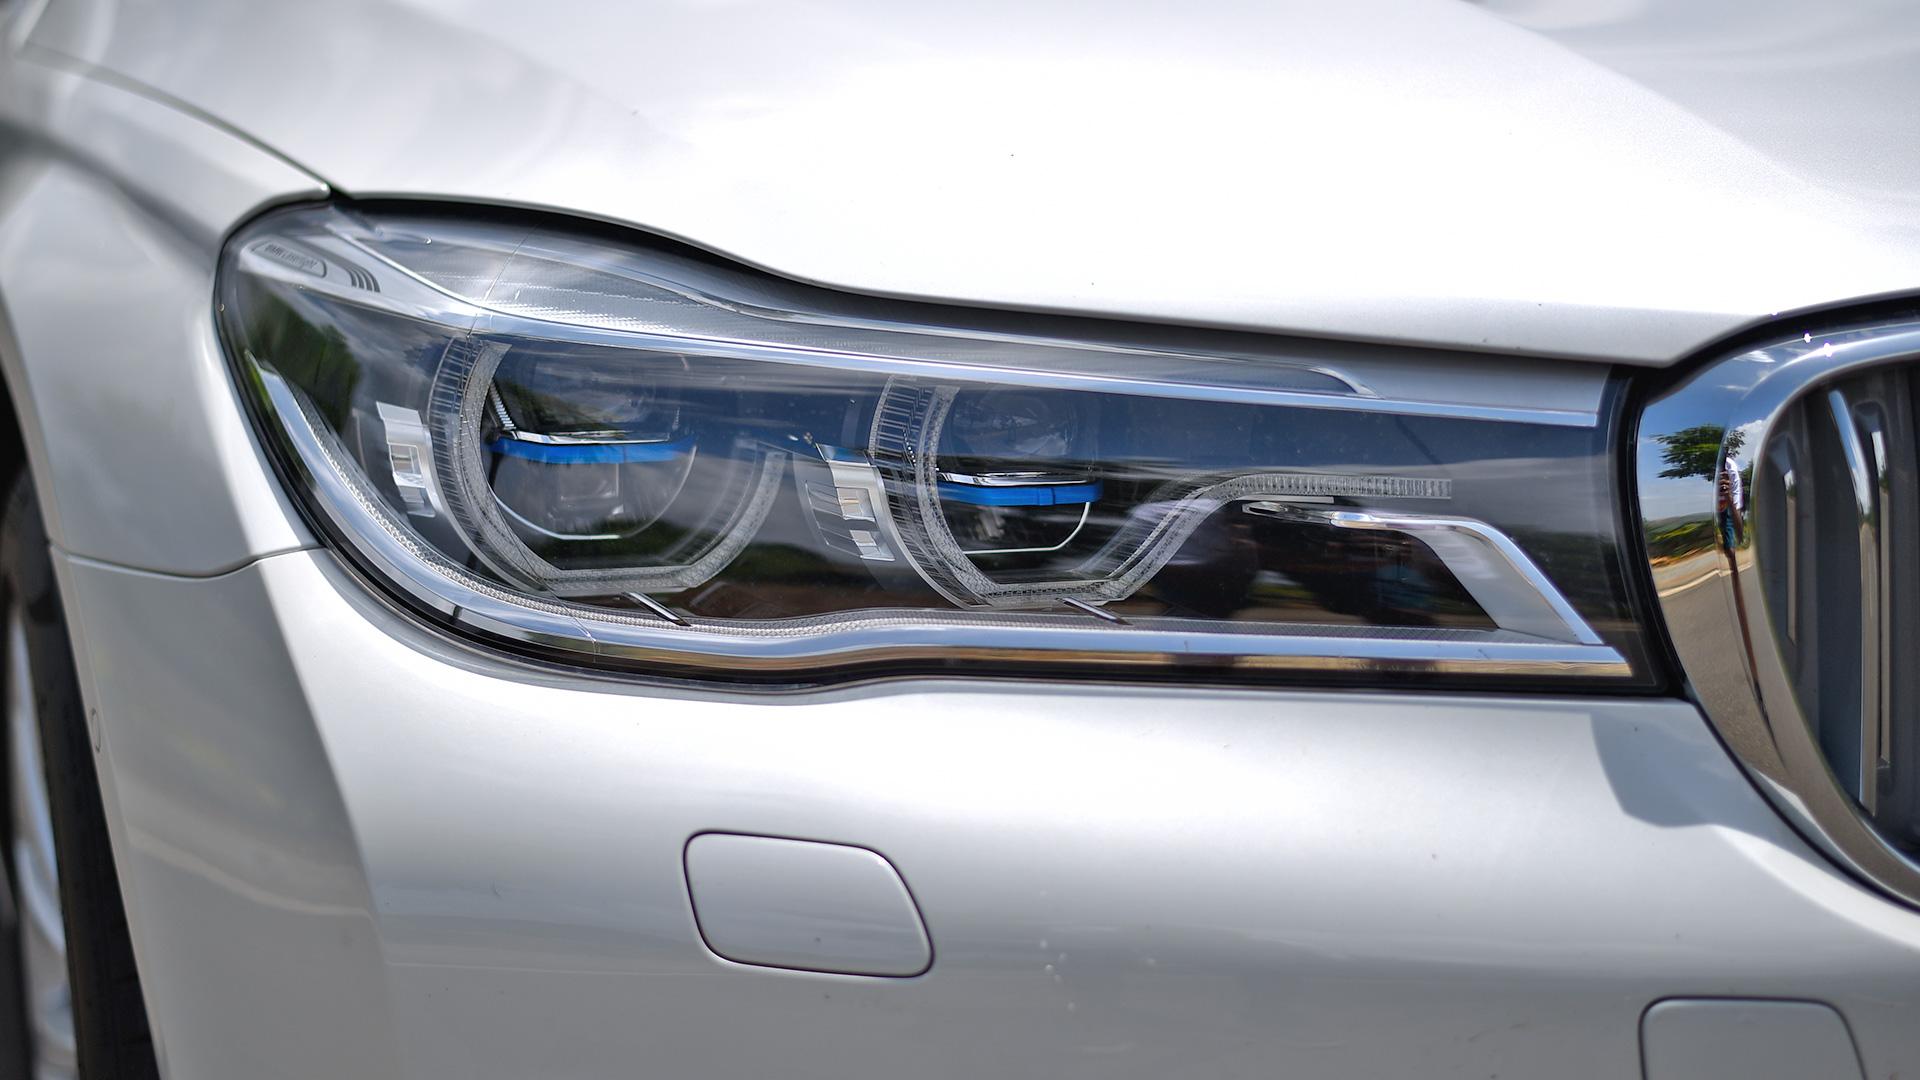 BMW 7 series 2017 740Li DPE Signature Exterior